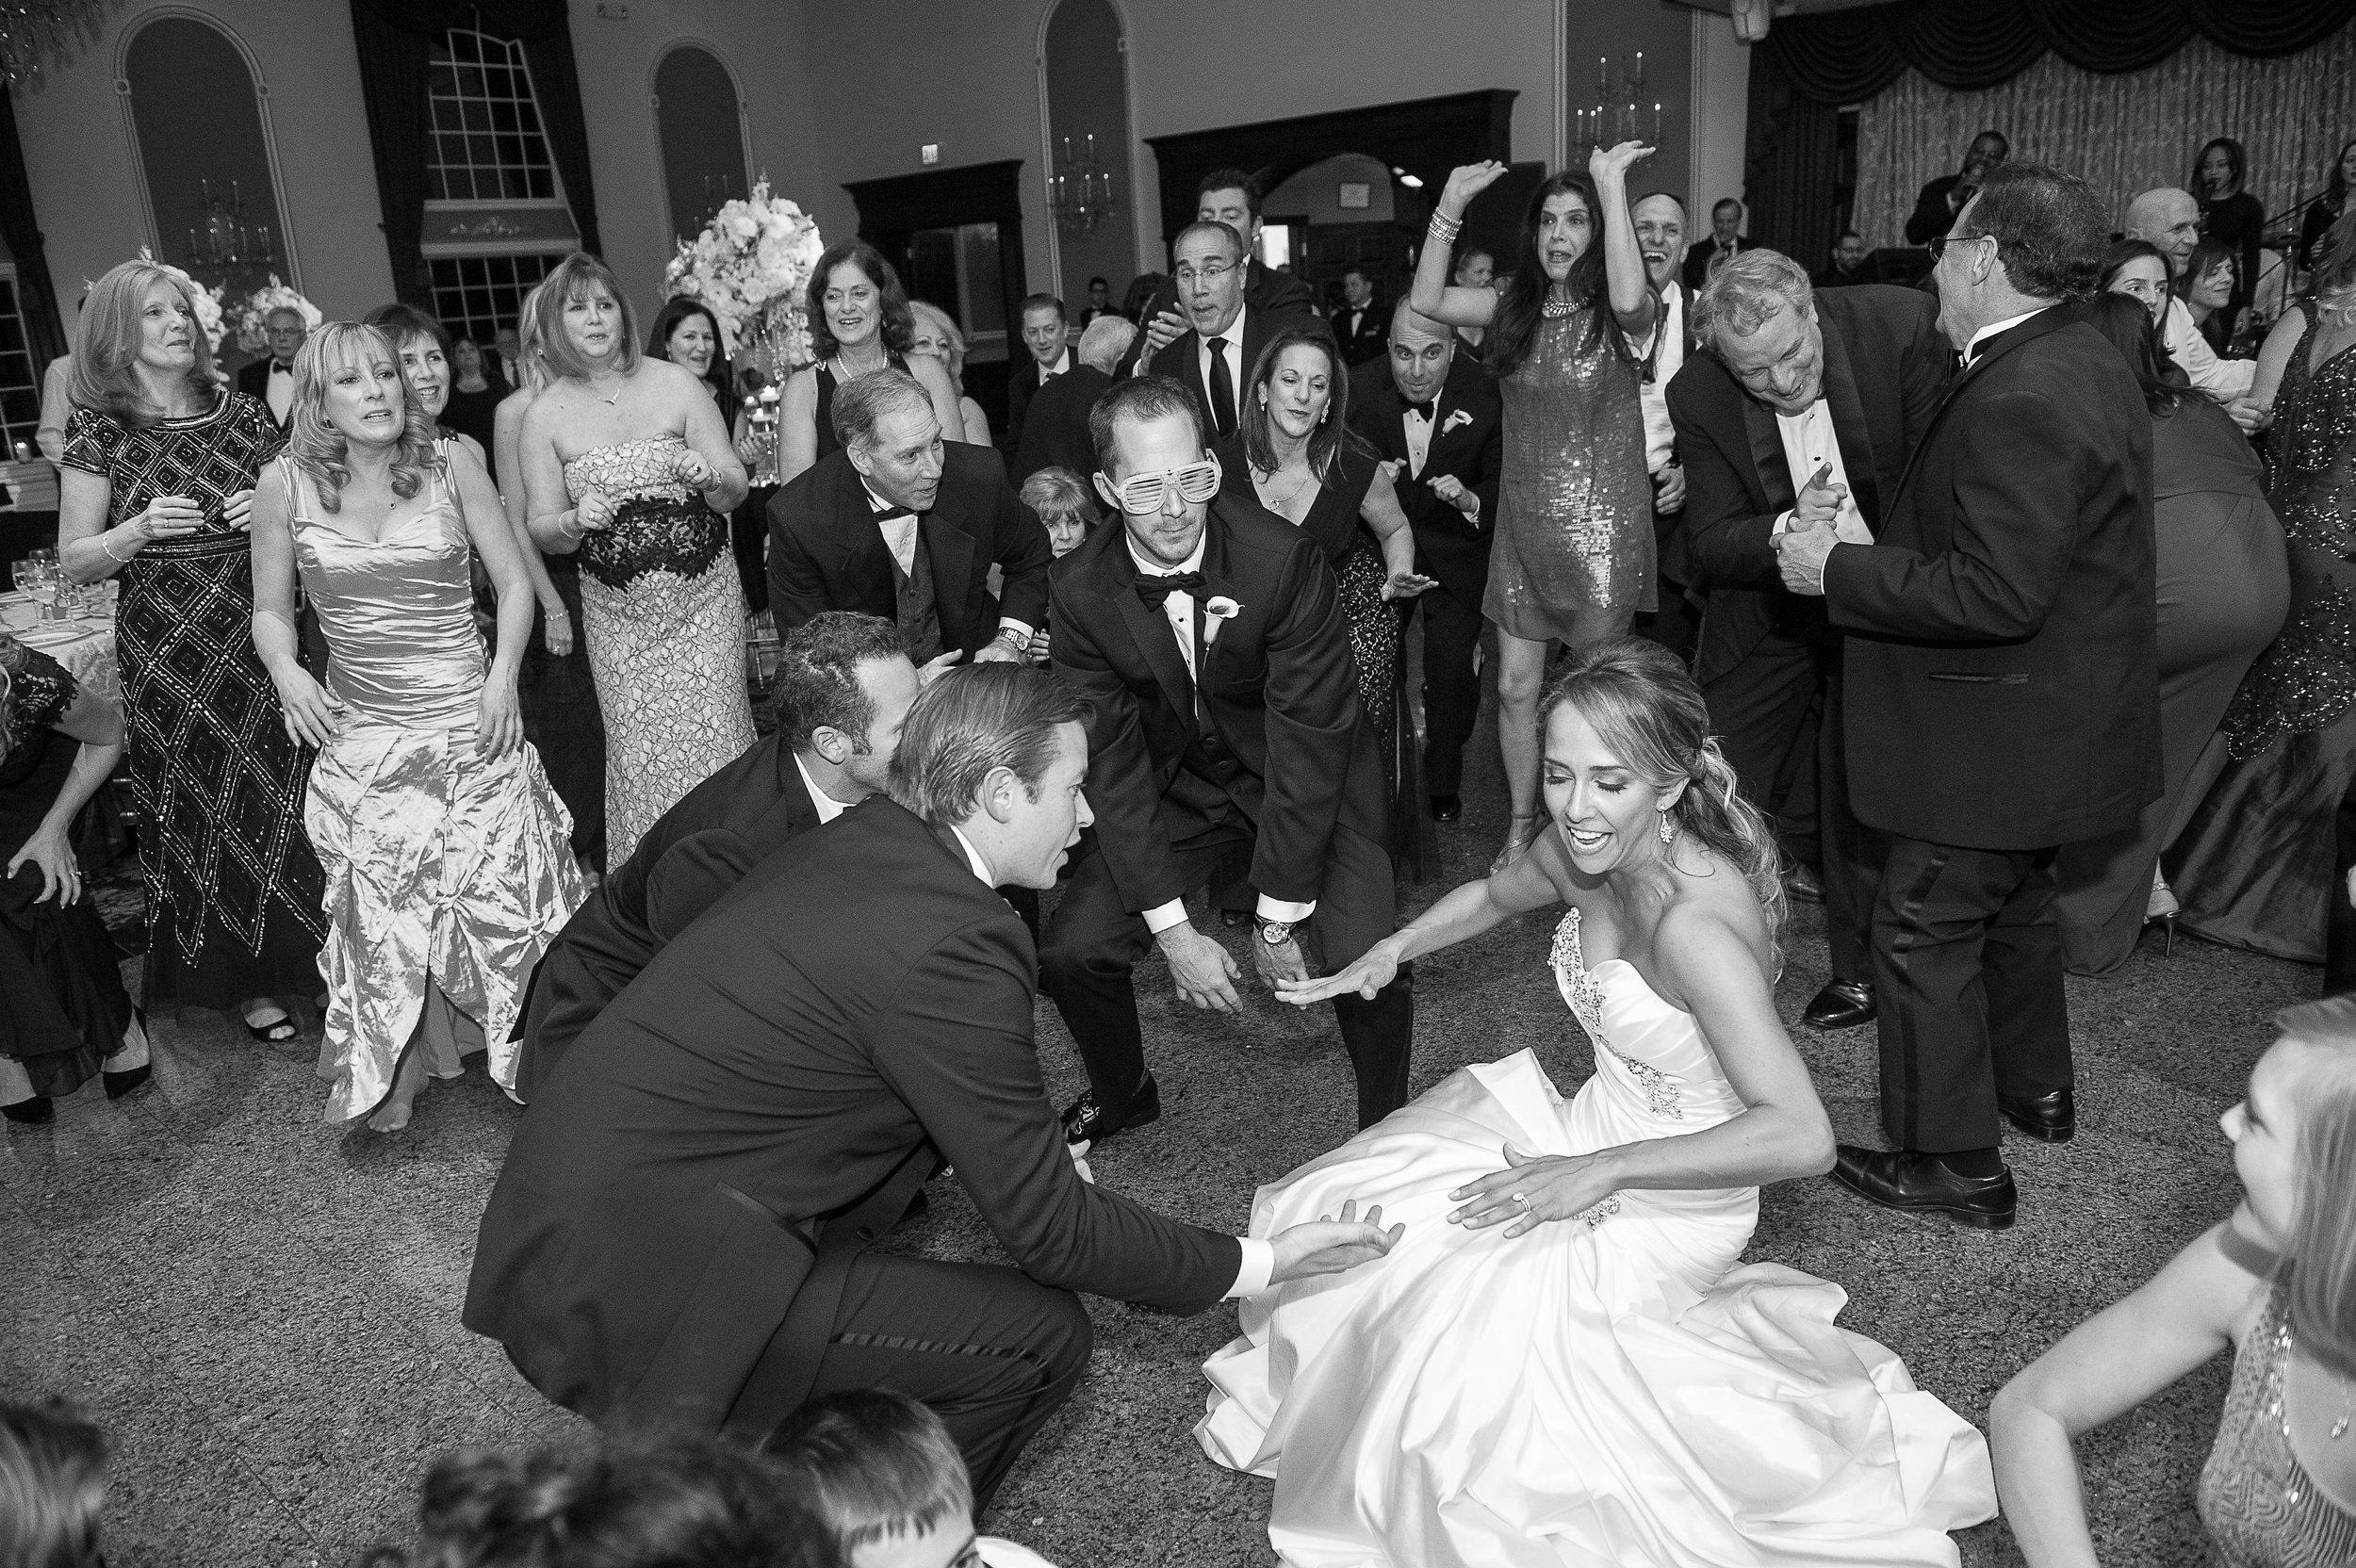 Ceci_New_York_Custom_Invitation_ New_Jersey_Wedding_Luxury_Personalized_Ceci_Style_Bride_Foil_Stamping122.JPG